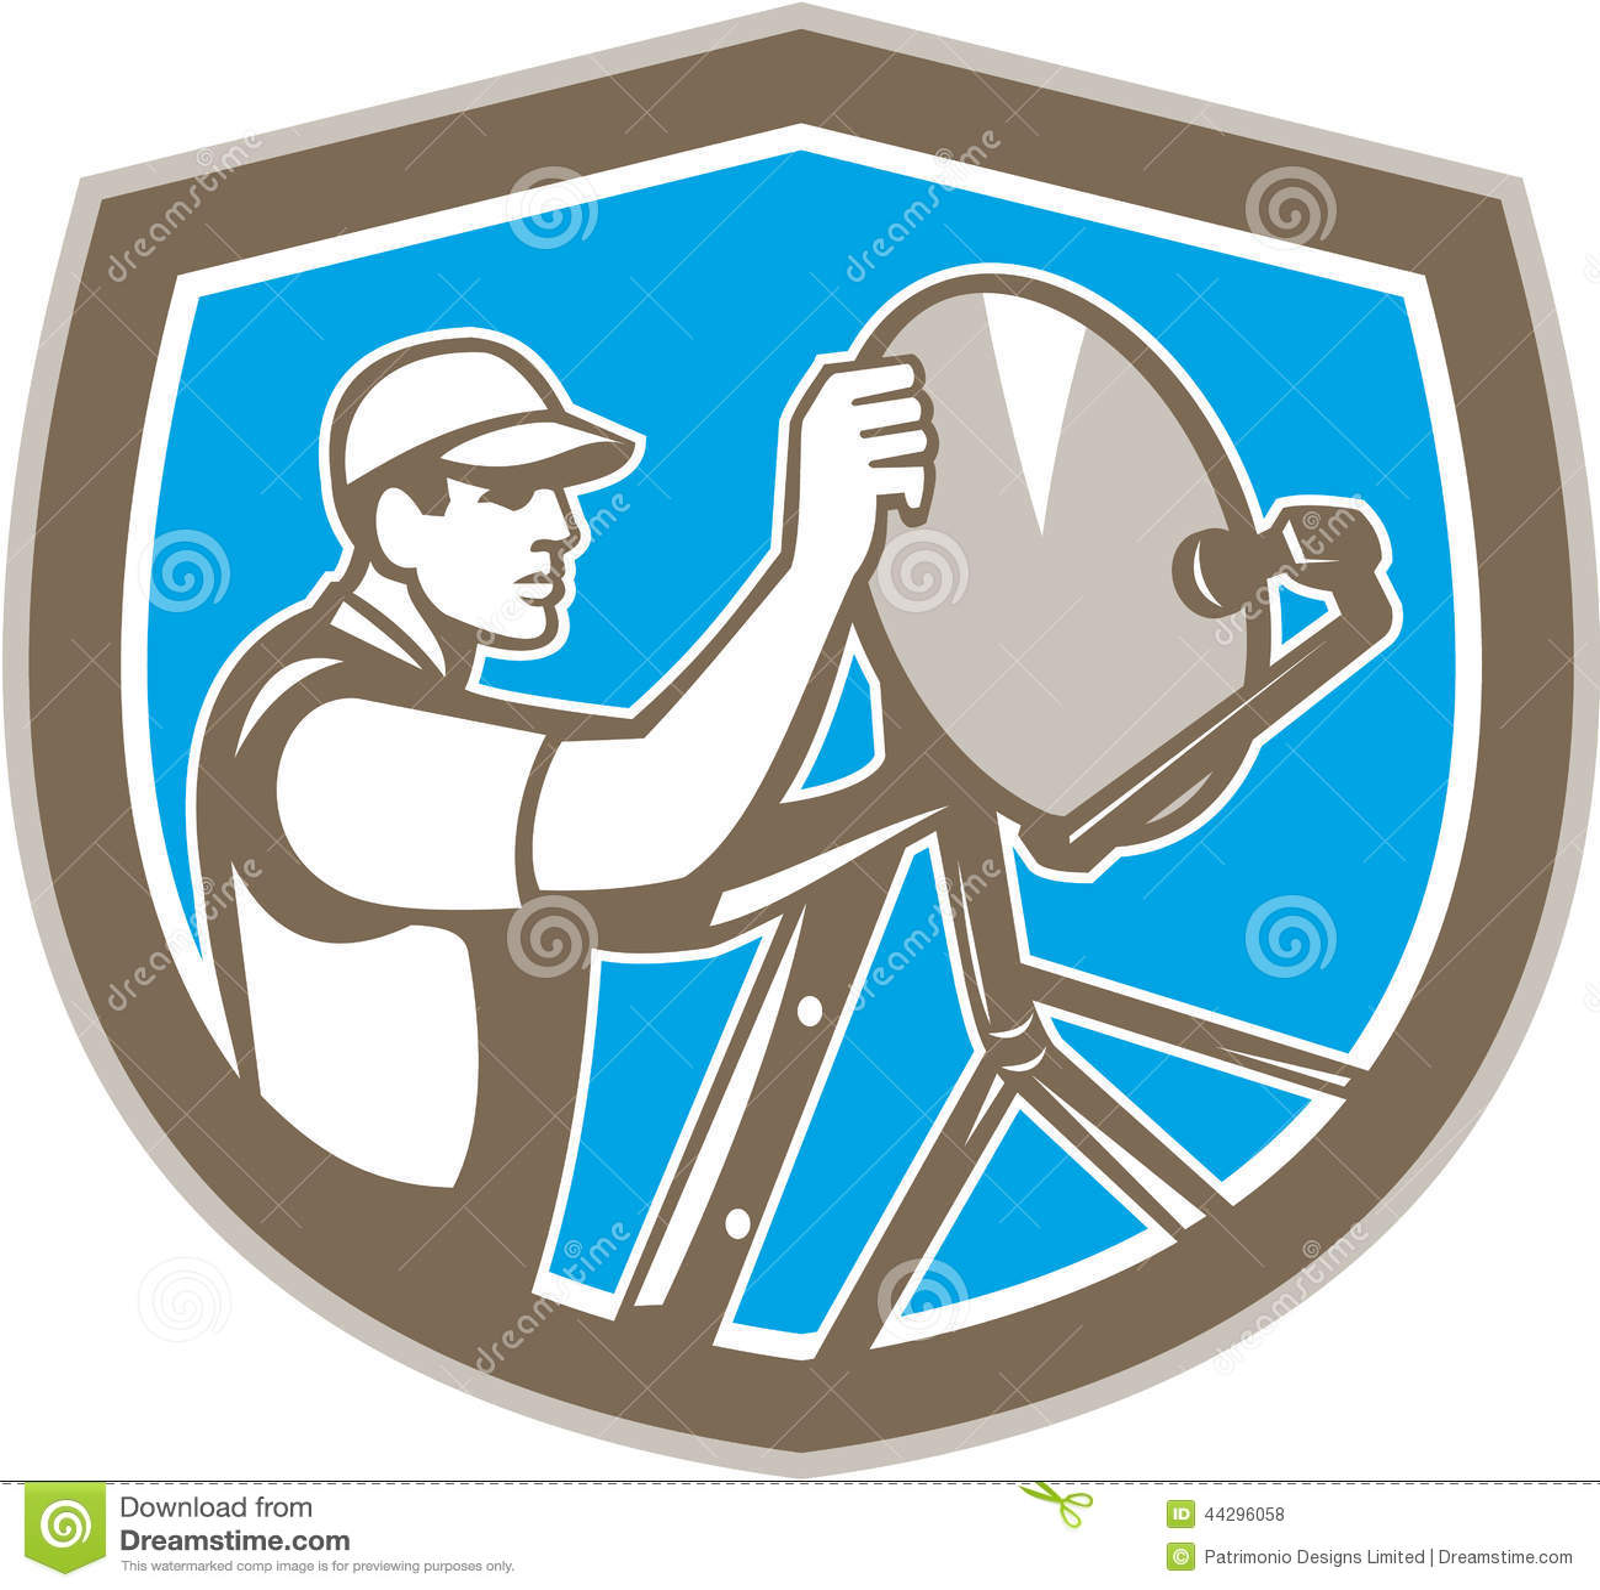 TV Satellite Dish Installer Shield Retro Vector Image – Satellite Dish Technician